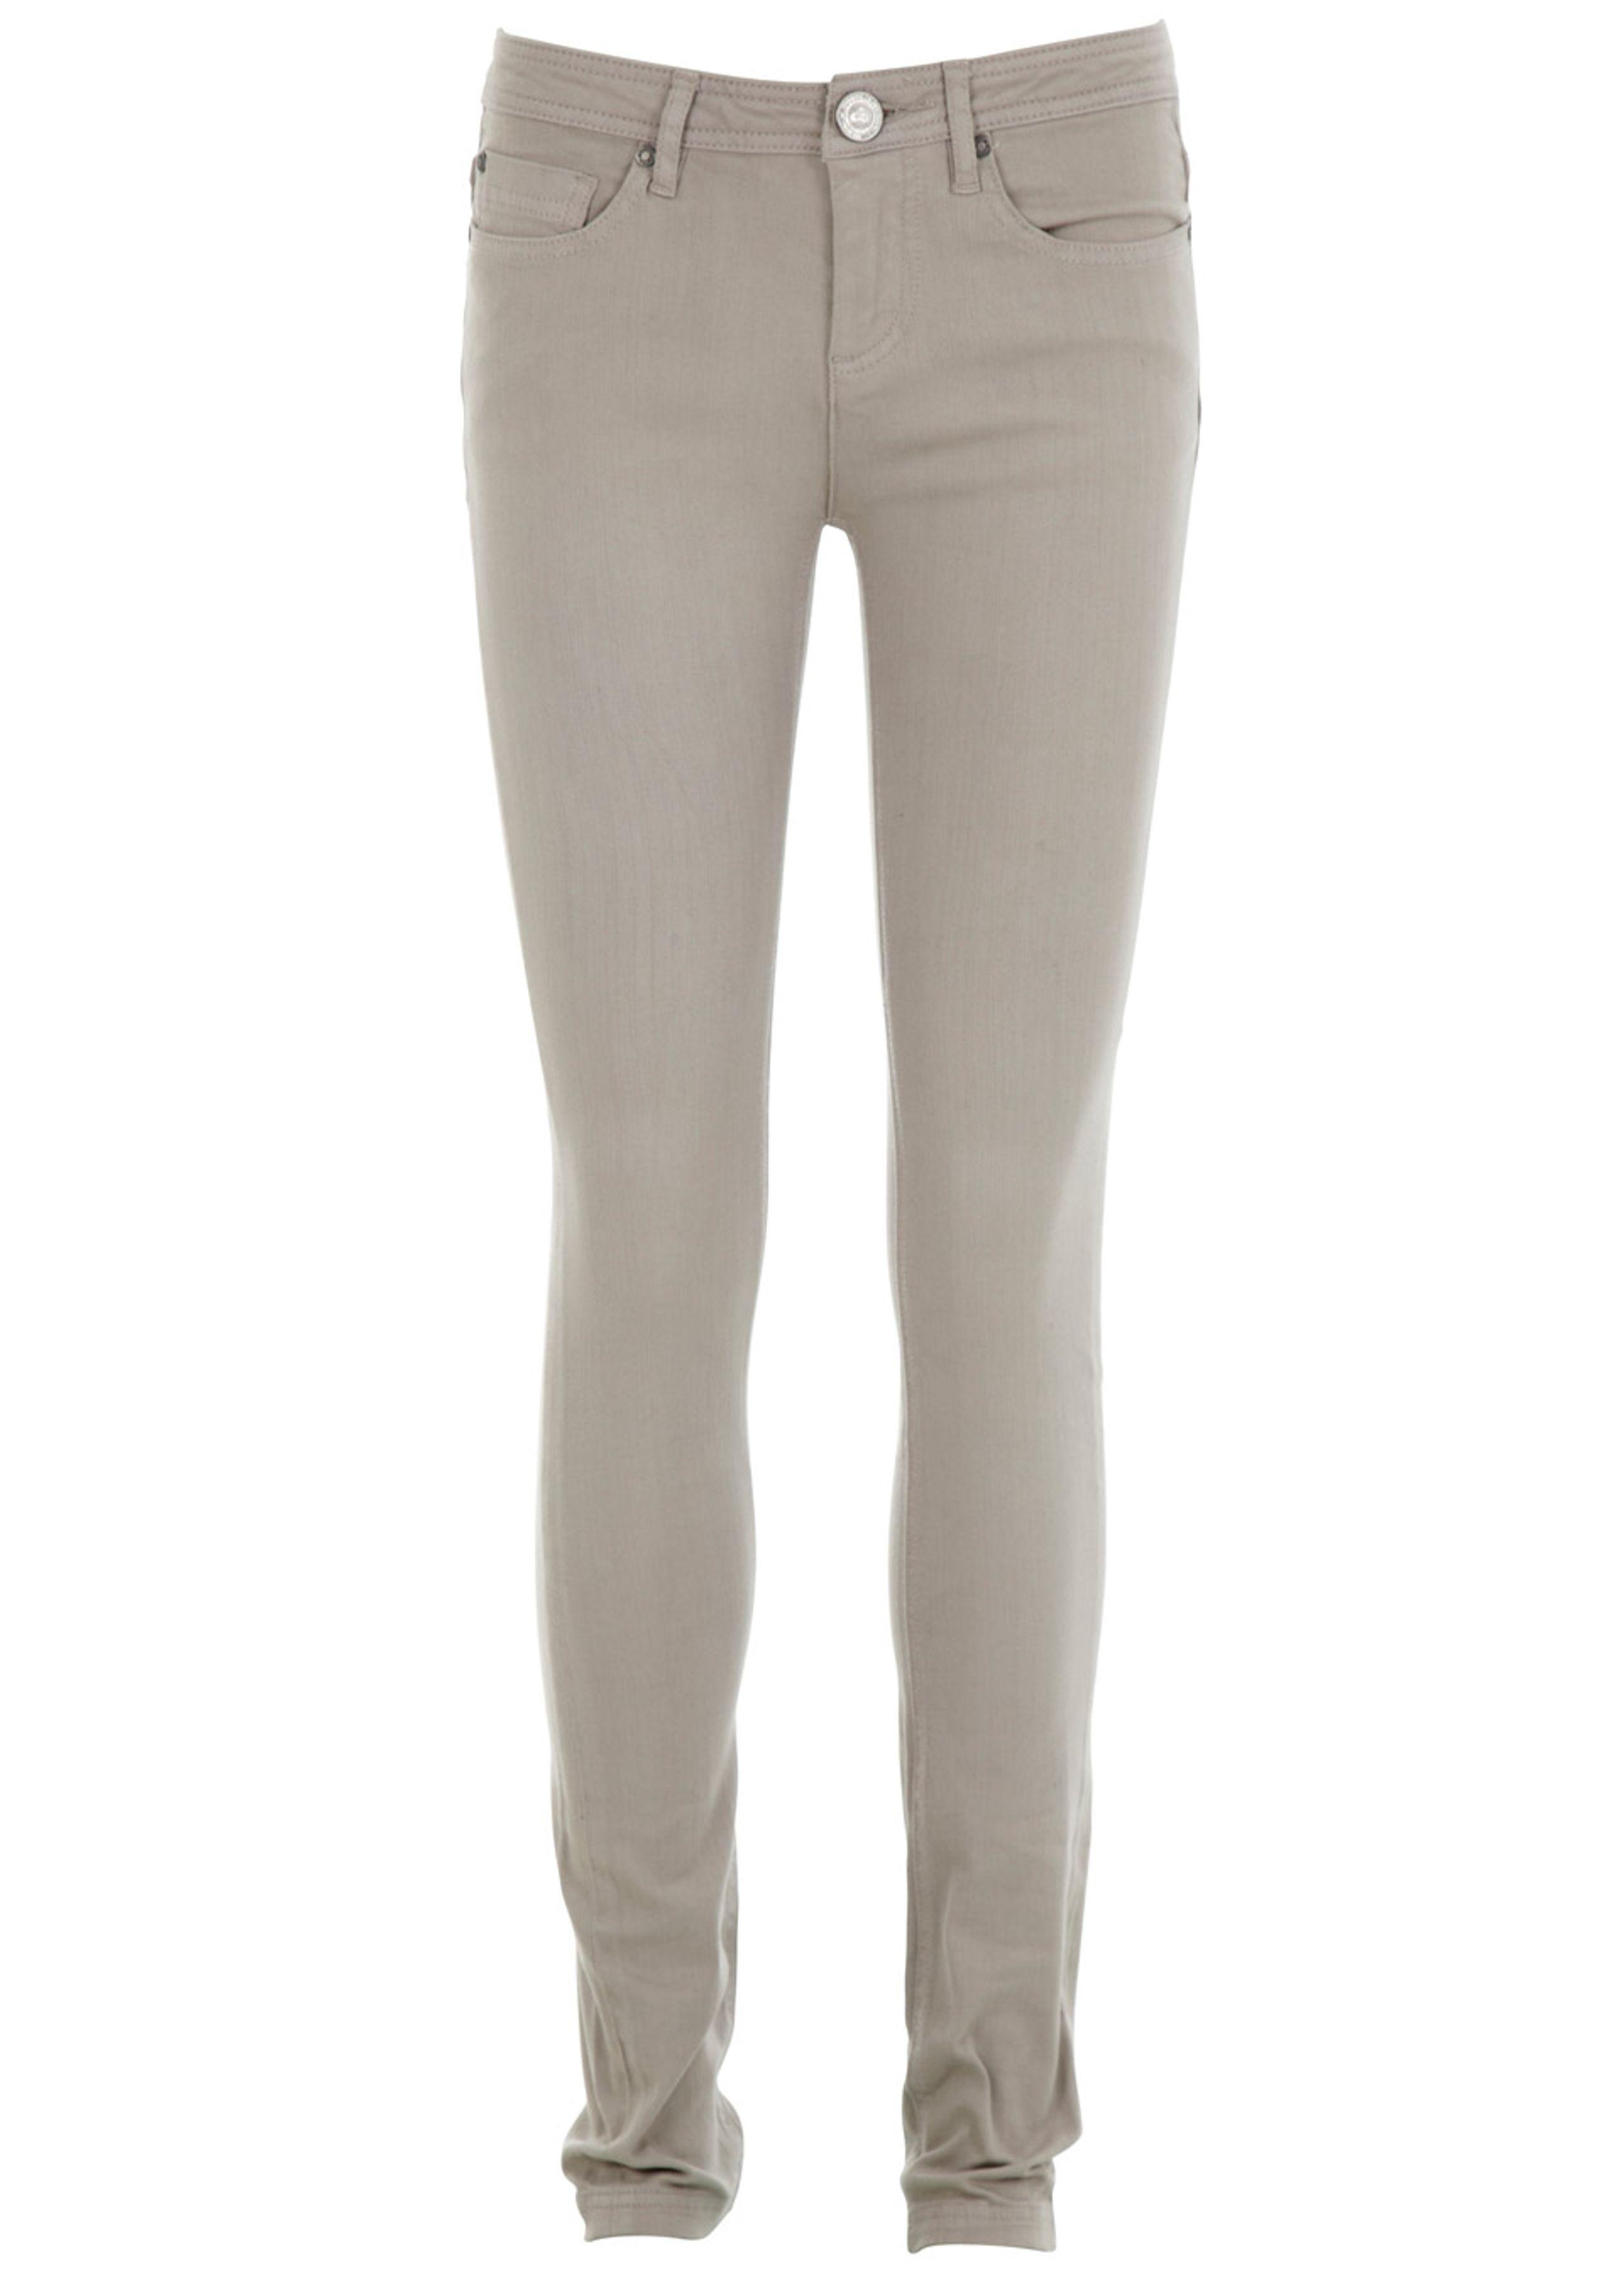 Evie straight jeans